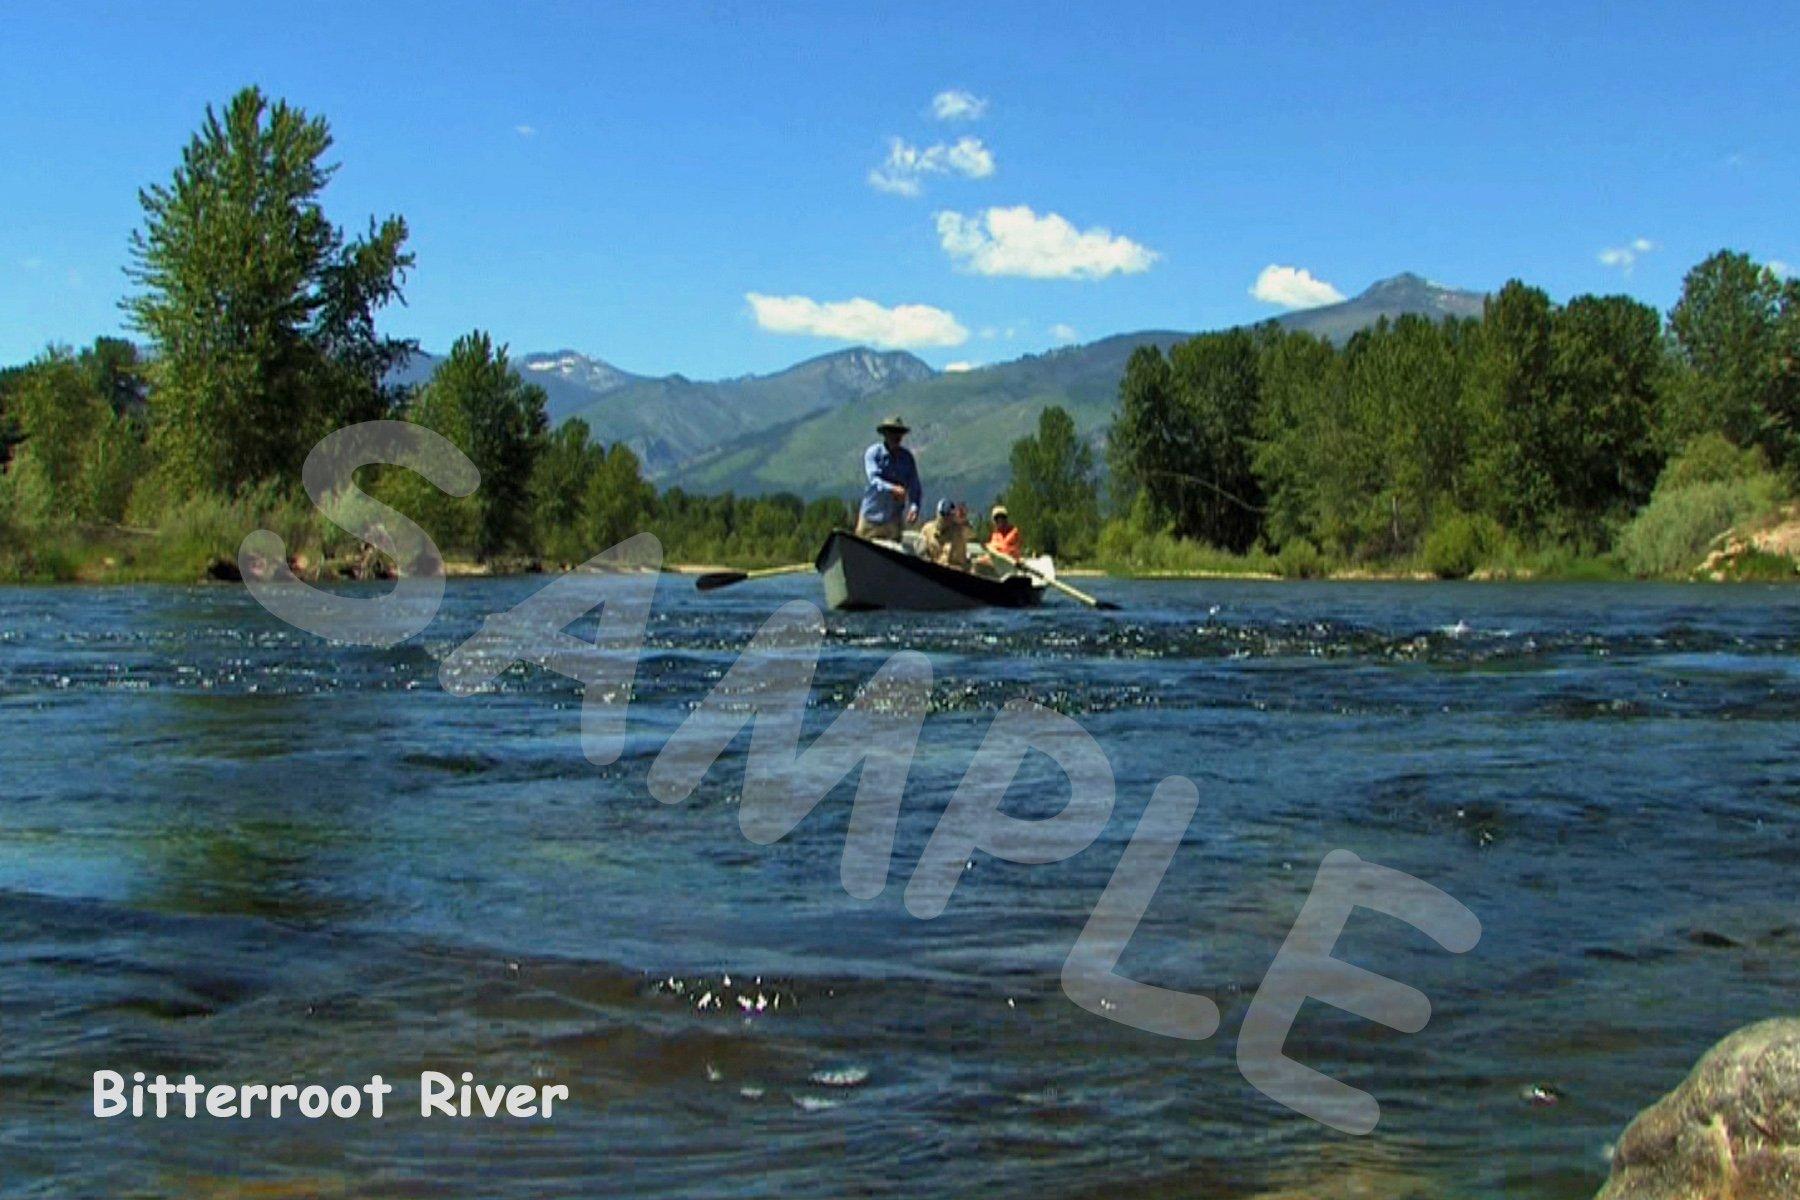 Bitterroot River (Boat) Fabric Block